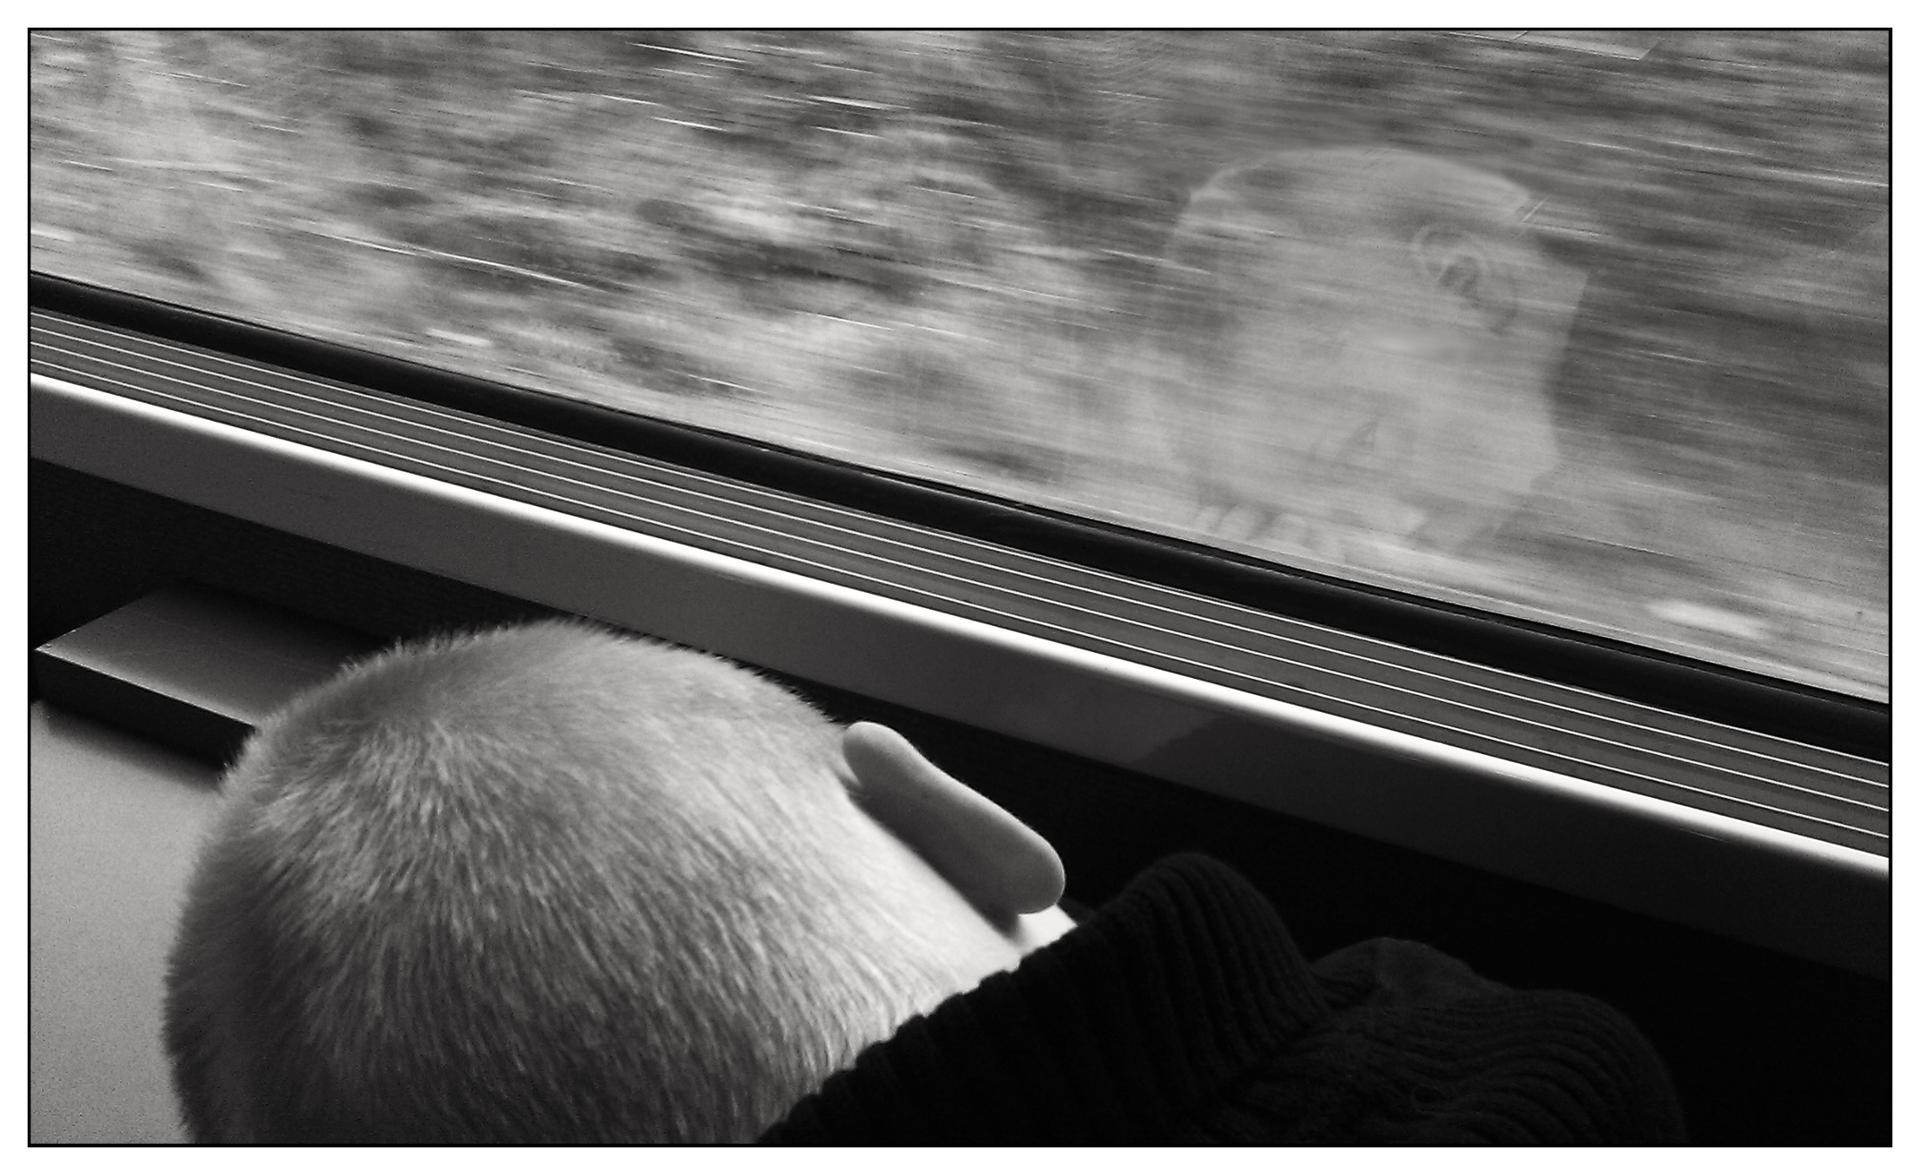 Mon premier voyage en train